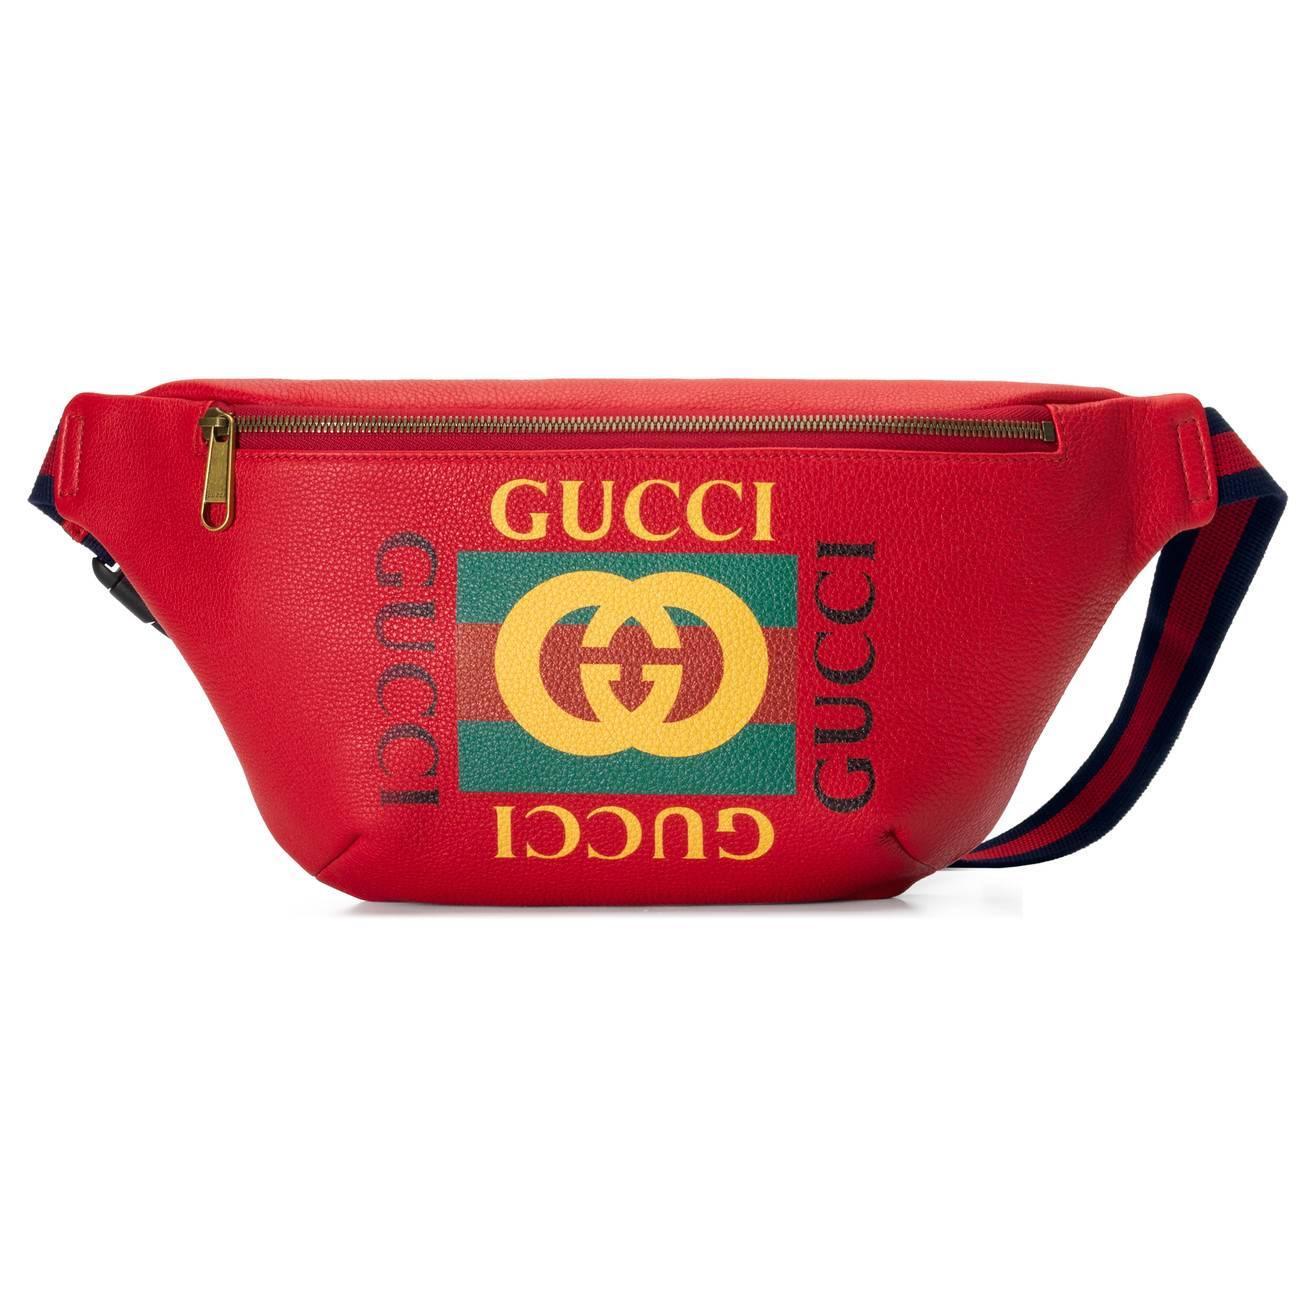 44ea746e4ad8 Gucci - Red Print Leather Belt Bag for Men - Lyst. View fullscreen